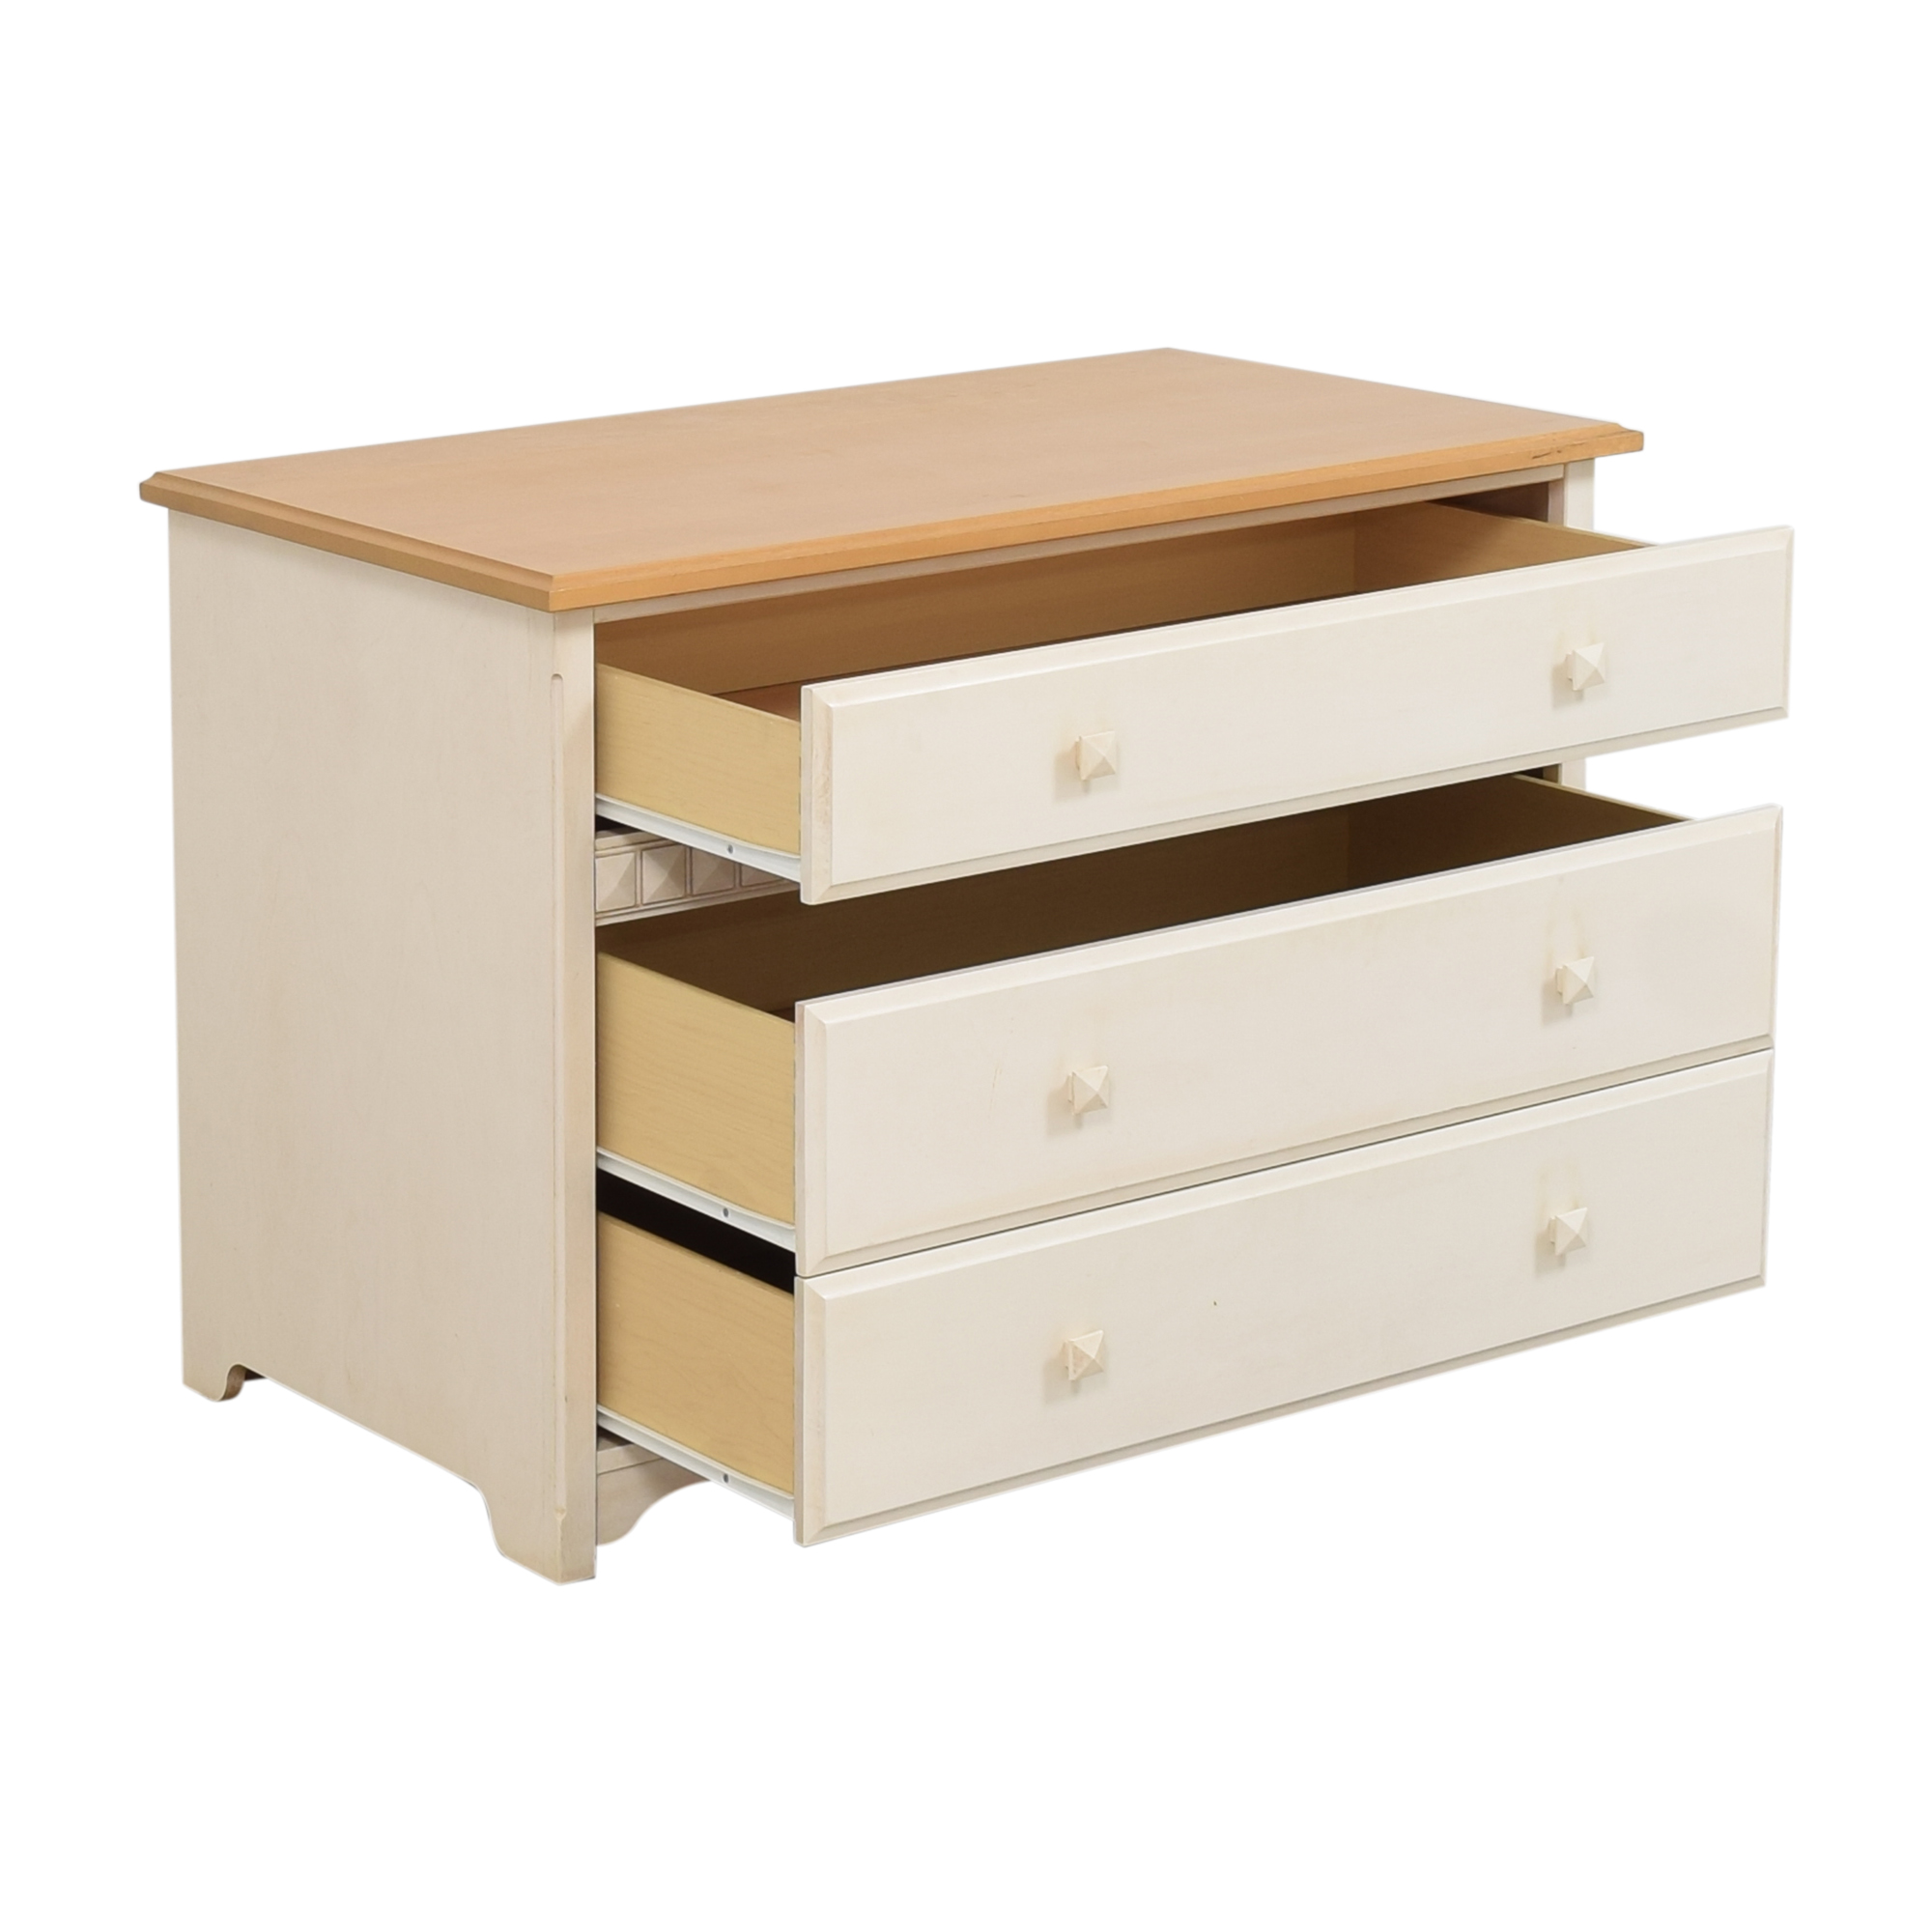 buy Morigeau-Lepine Three Drawer Dresser Morigeau-Lepine Dressers